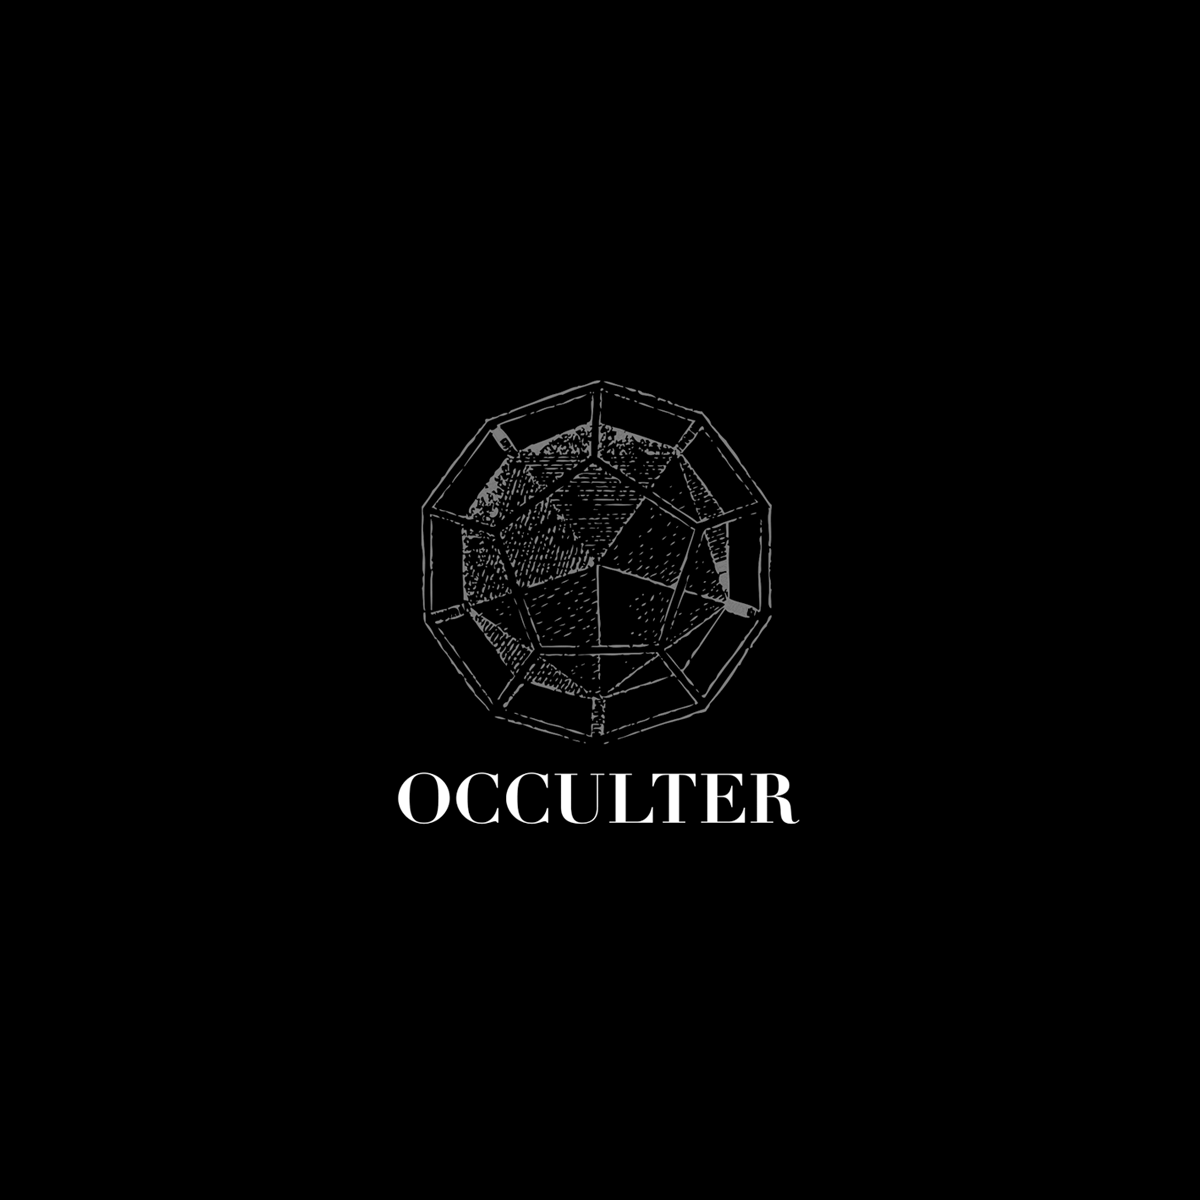 occulter_logo_portfolio_square_smalllogo.png